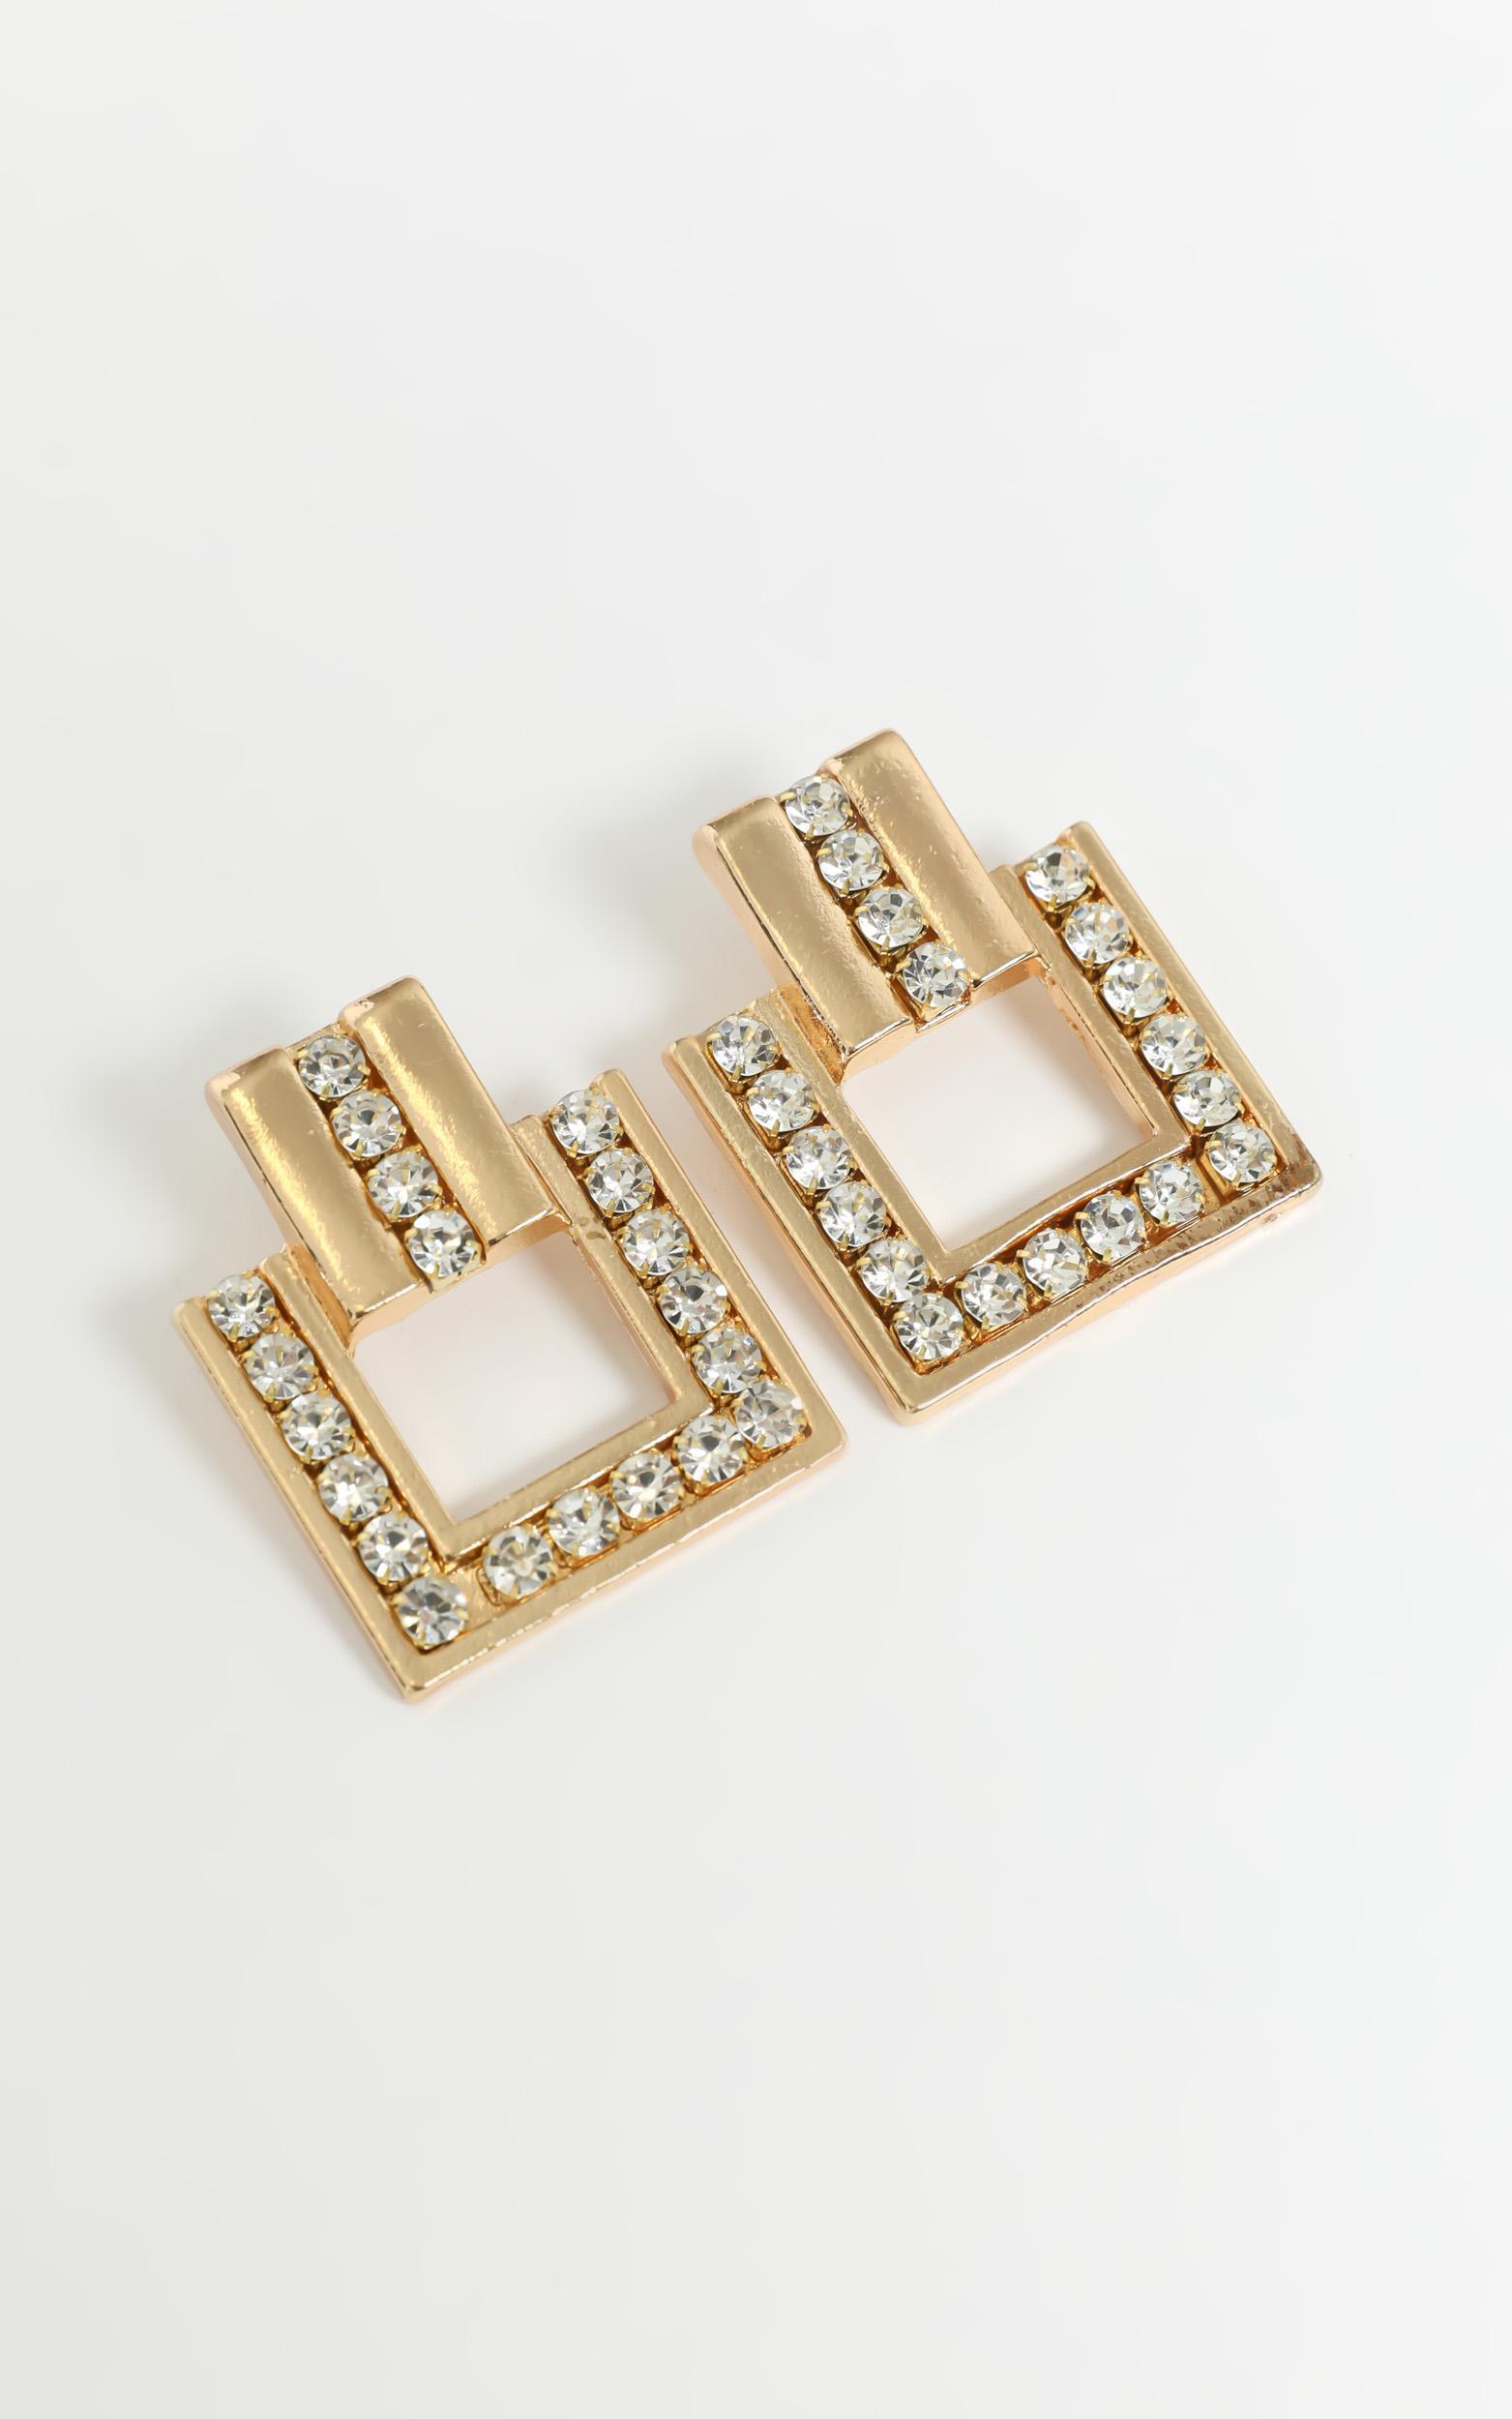 Yesenia Earrings in Gold, , hi-res image number null